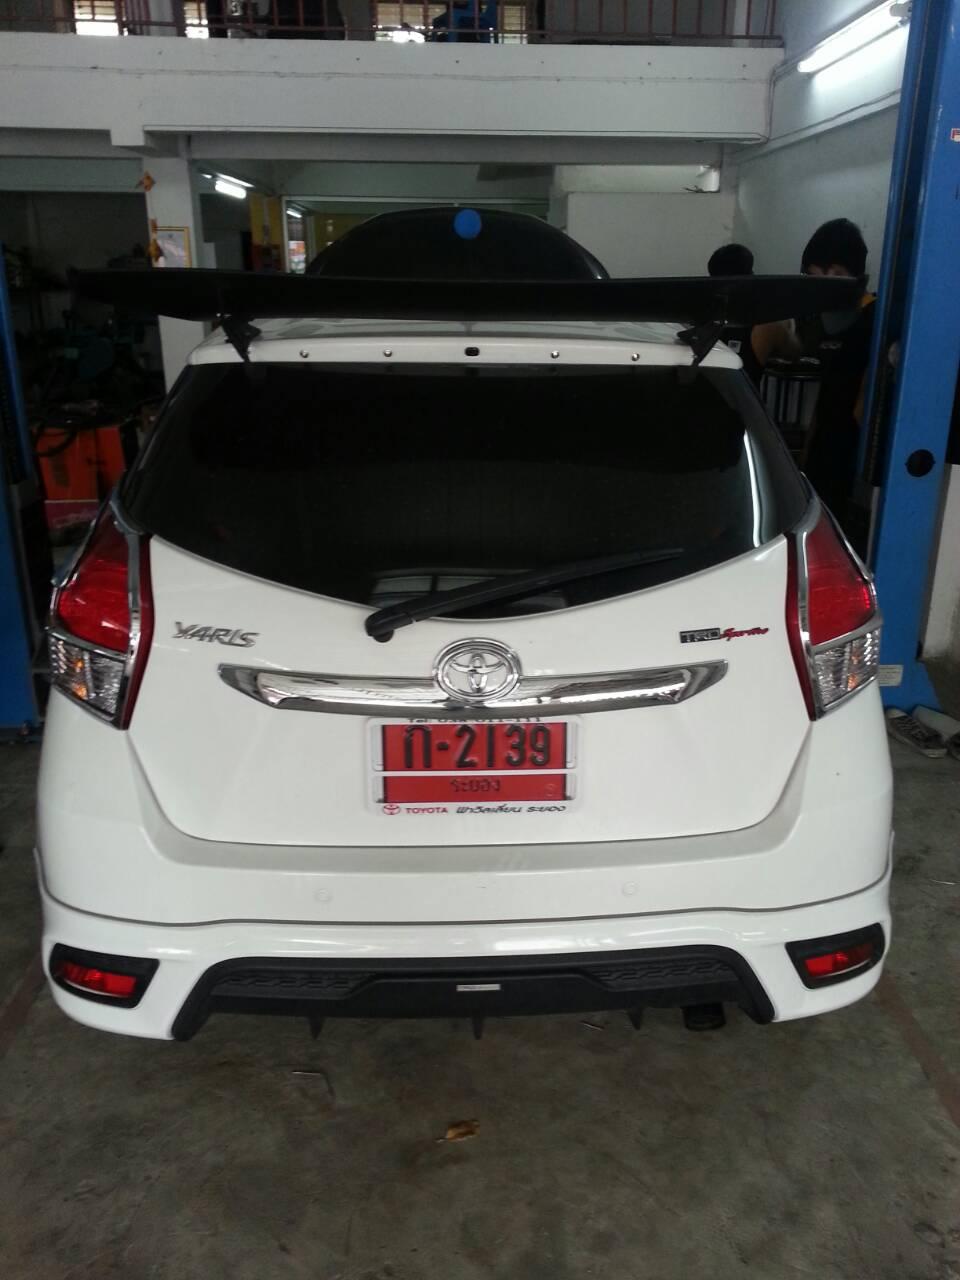 All New Toyota Yaris ชุดท่อ Jsใบสั้นคู่หม้อพักกลางสูตร